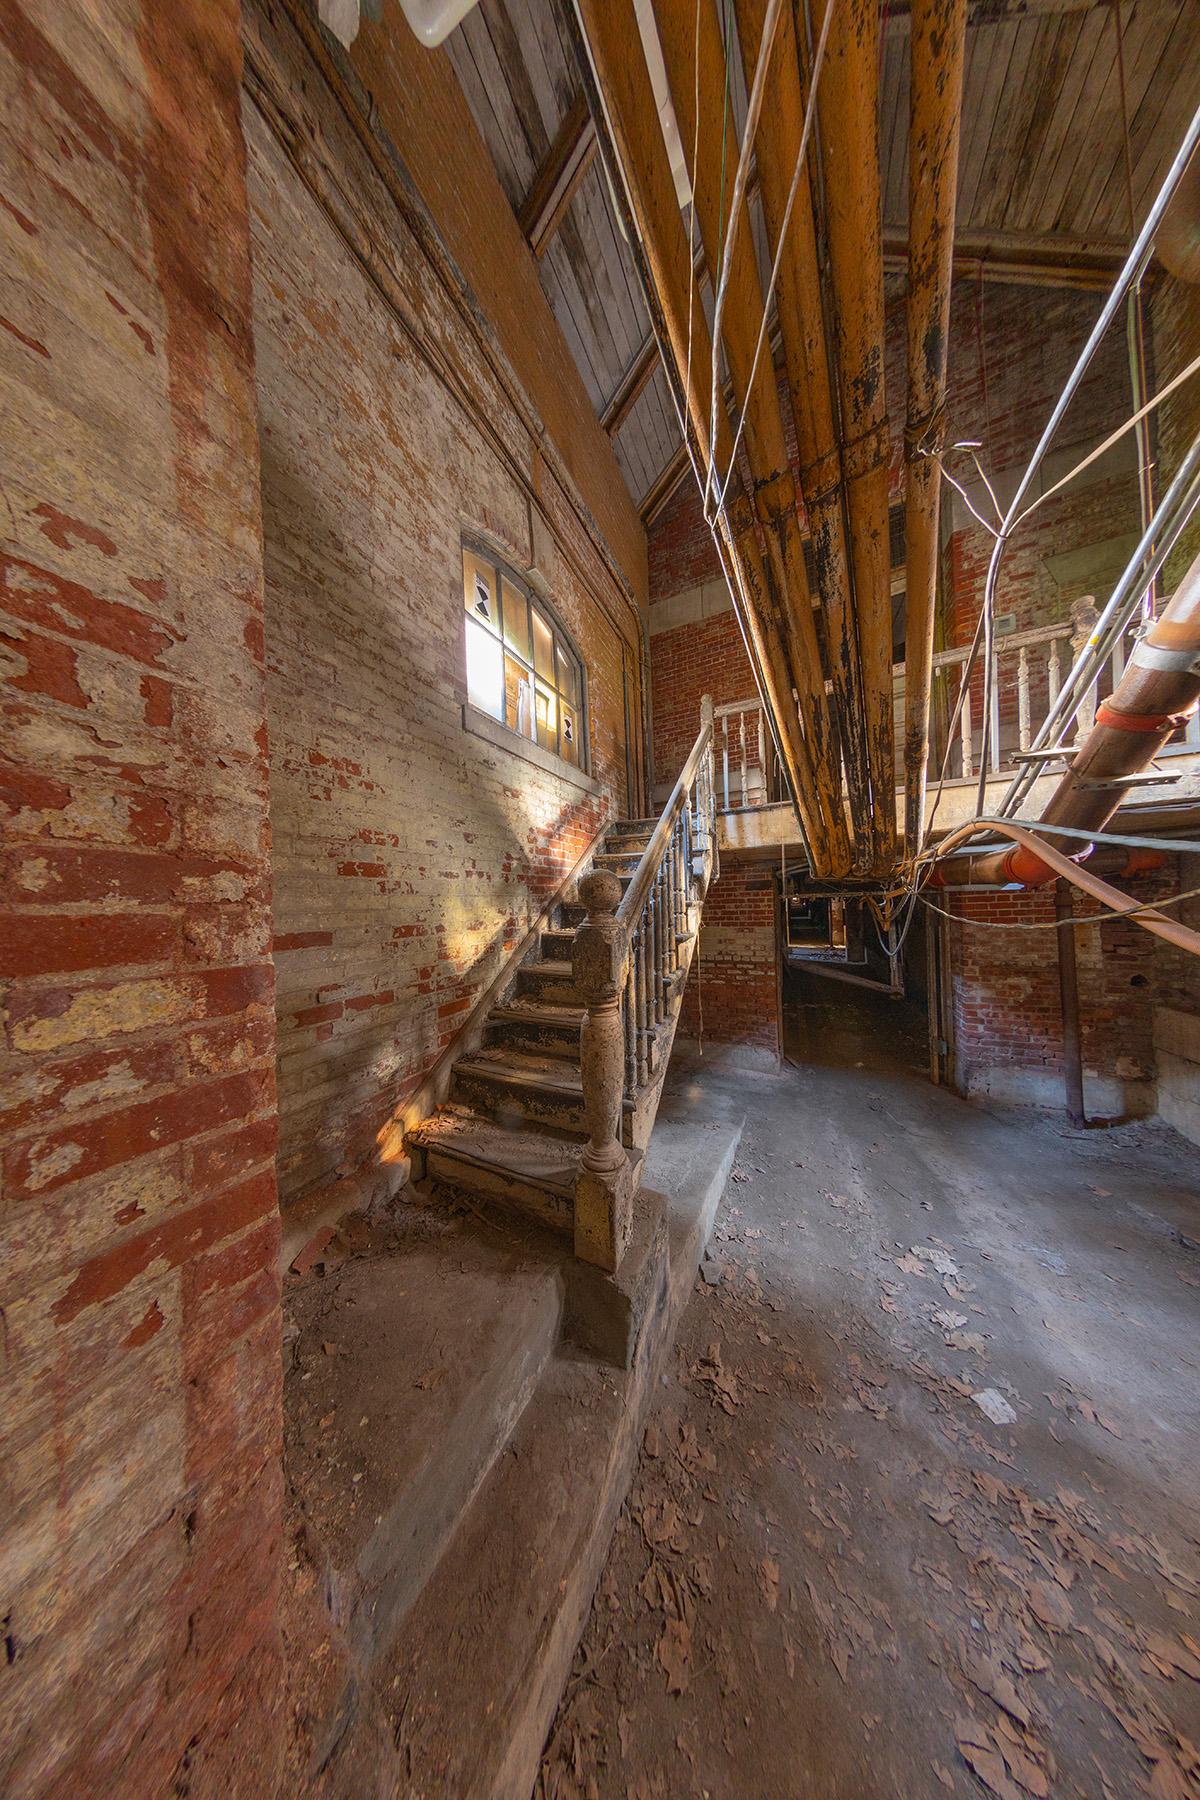 Stairs_and_Corridor_2NIK_C